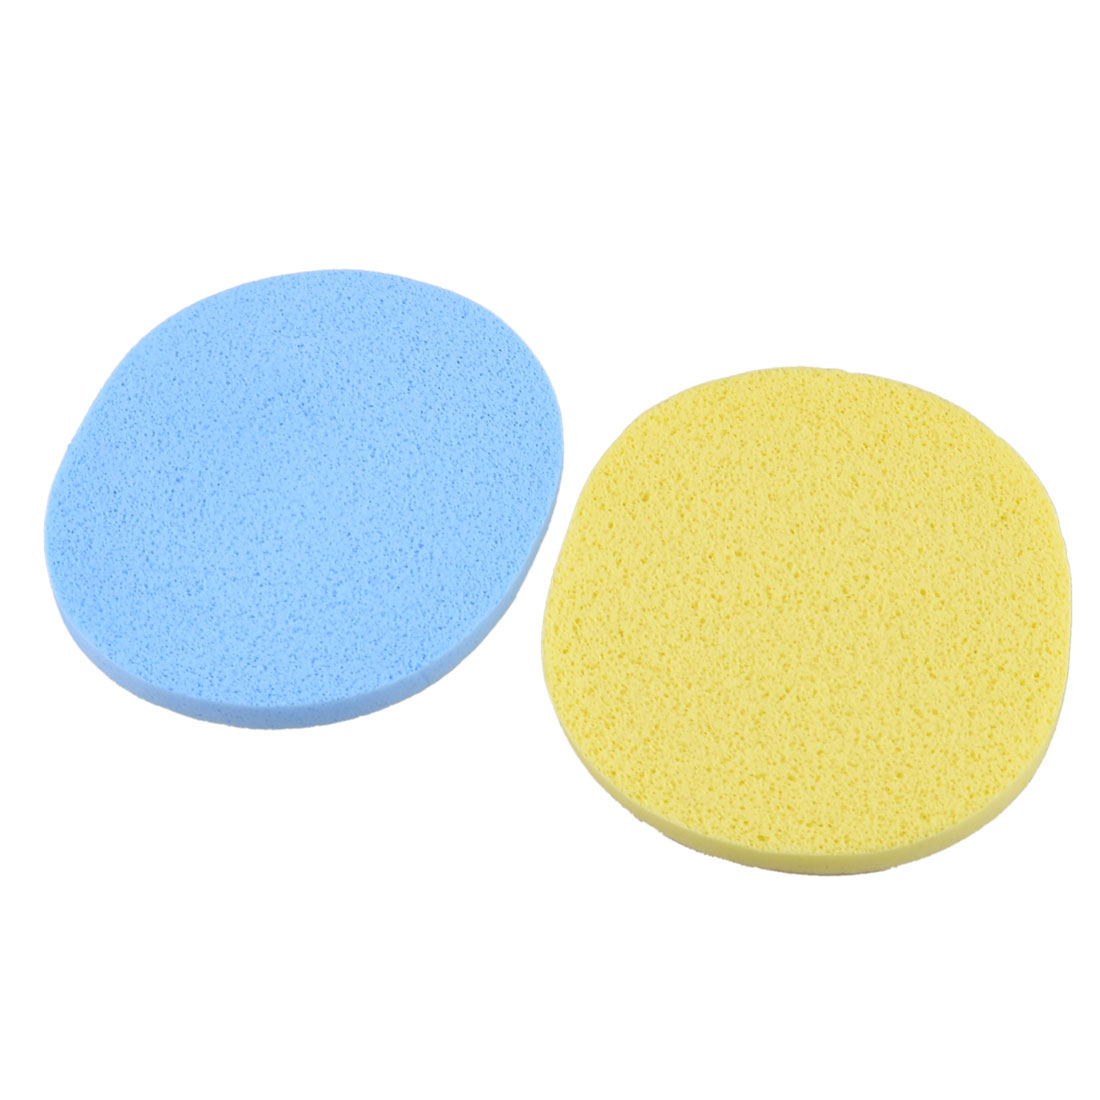 10.8cmx9cm Yellow Light Blue Oval Sponge Makeup Facial Cleaning Powder Puff 2 Pcs